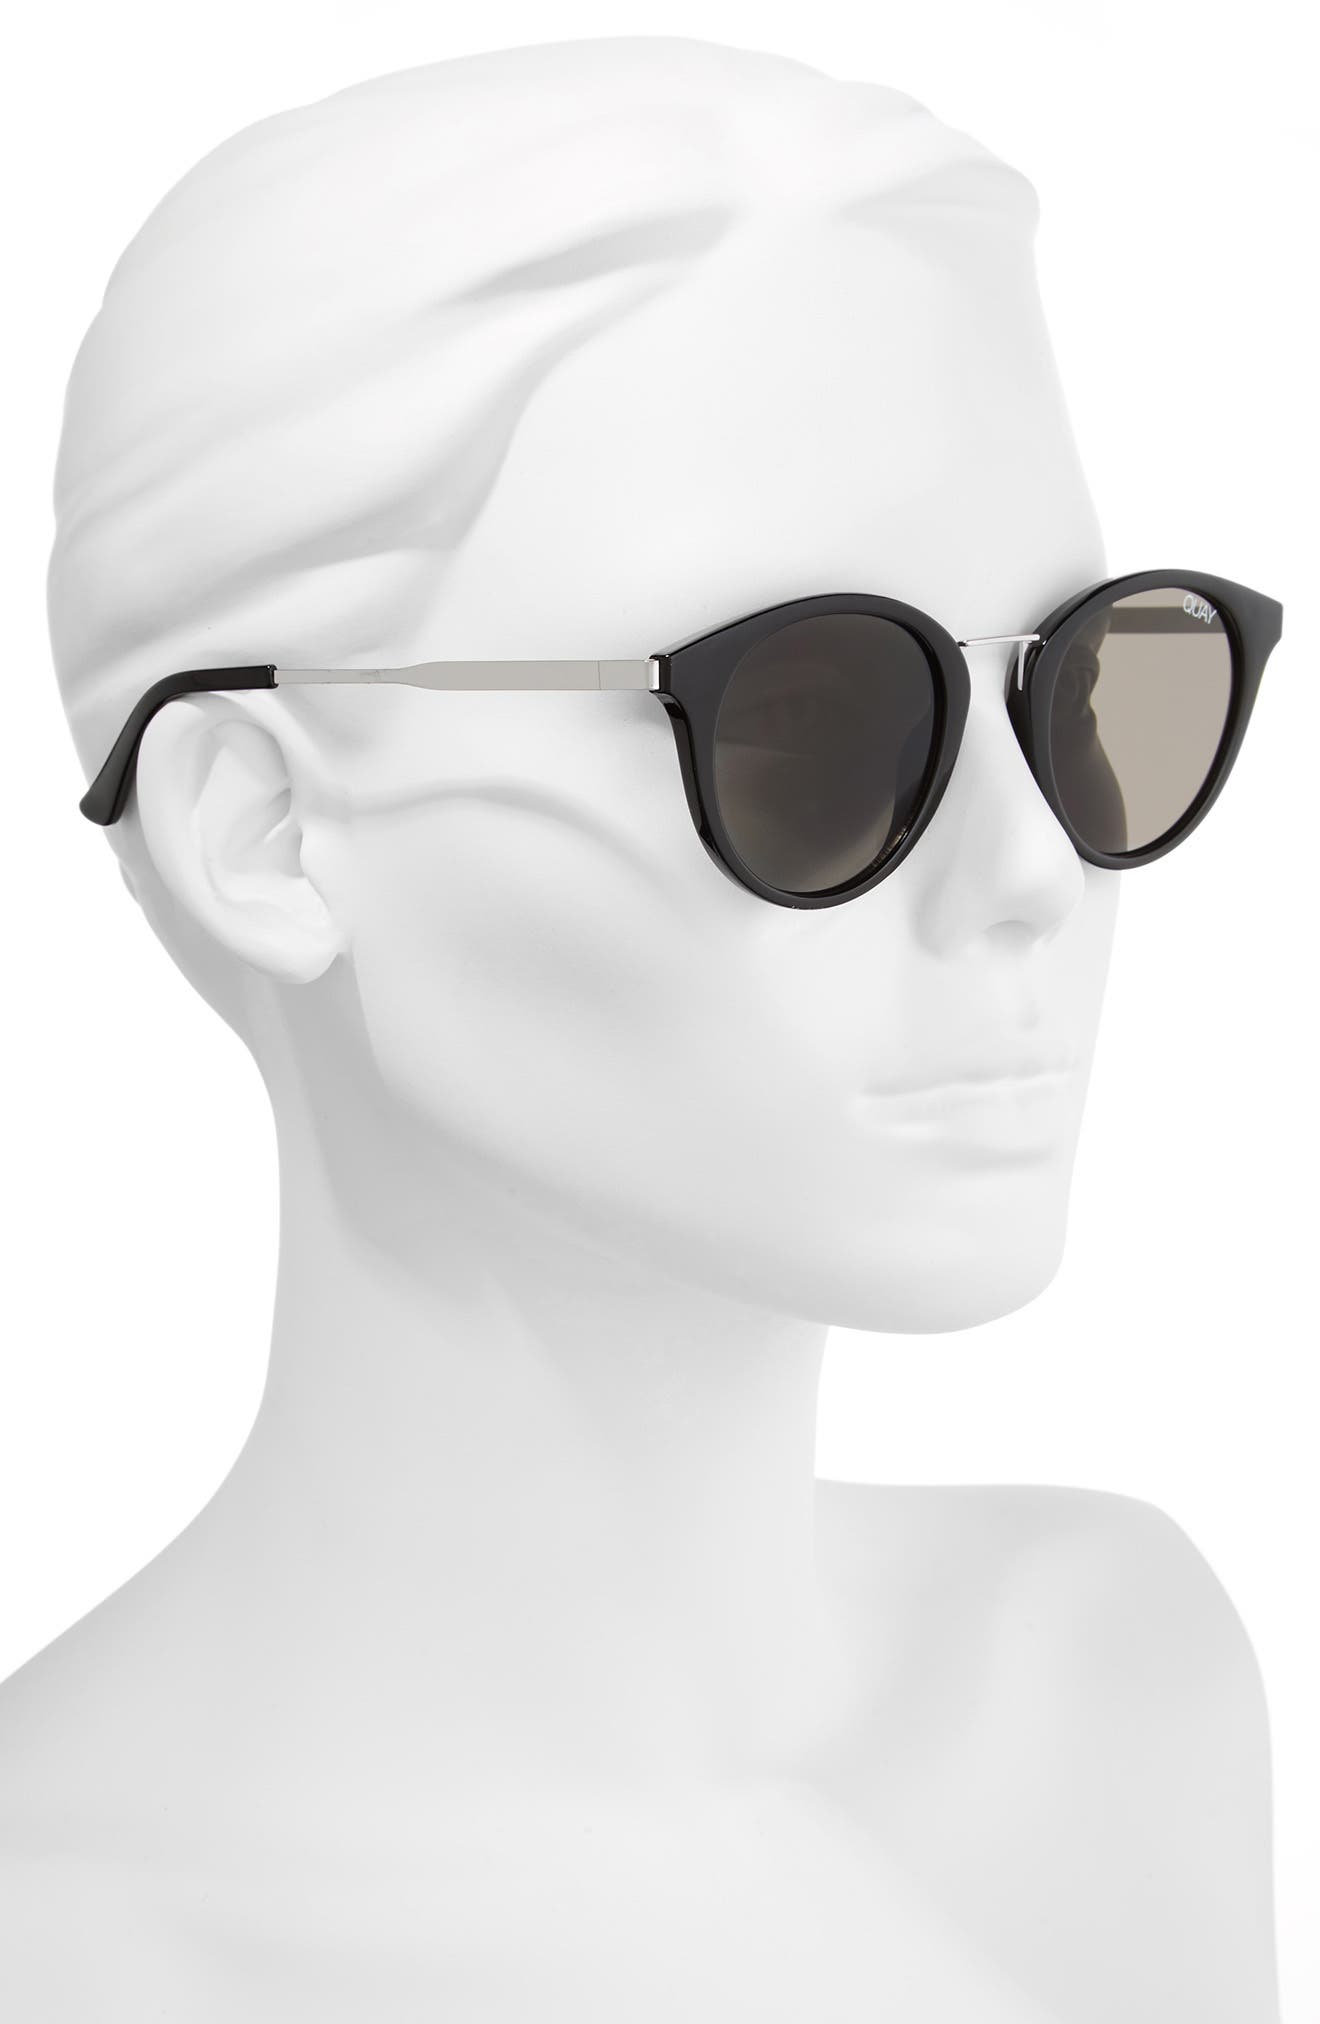 Gotta Run 48mm Sunglasses,                             Alternate thumbnail 2, color,                             001